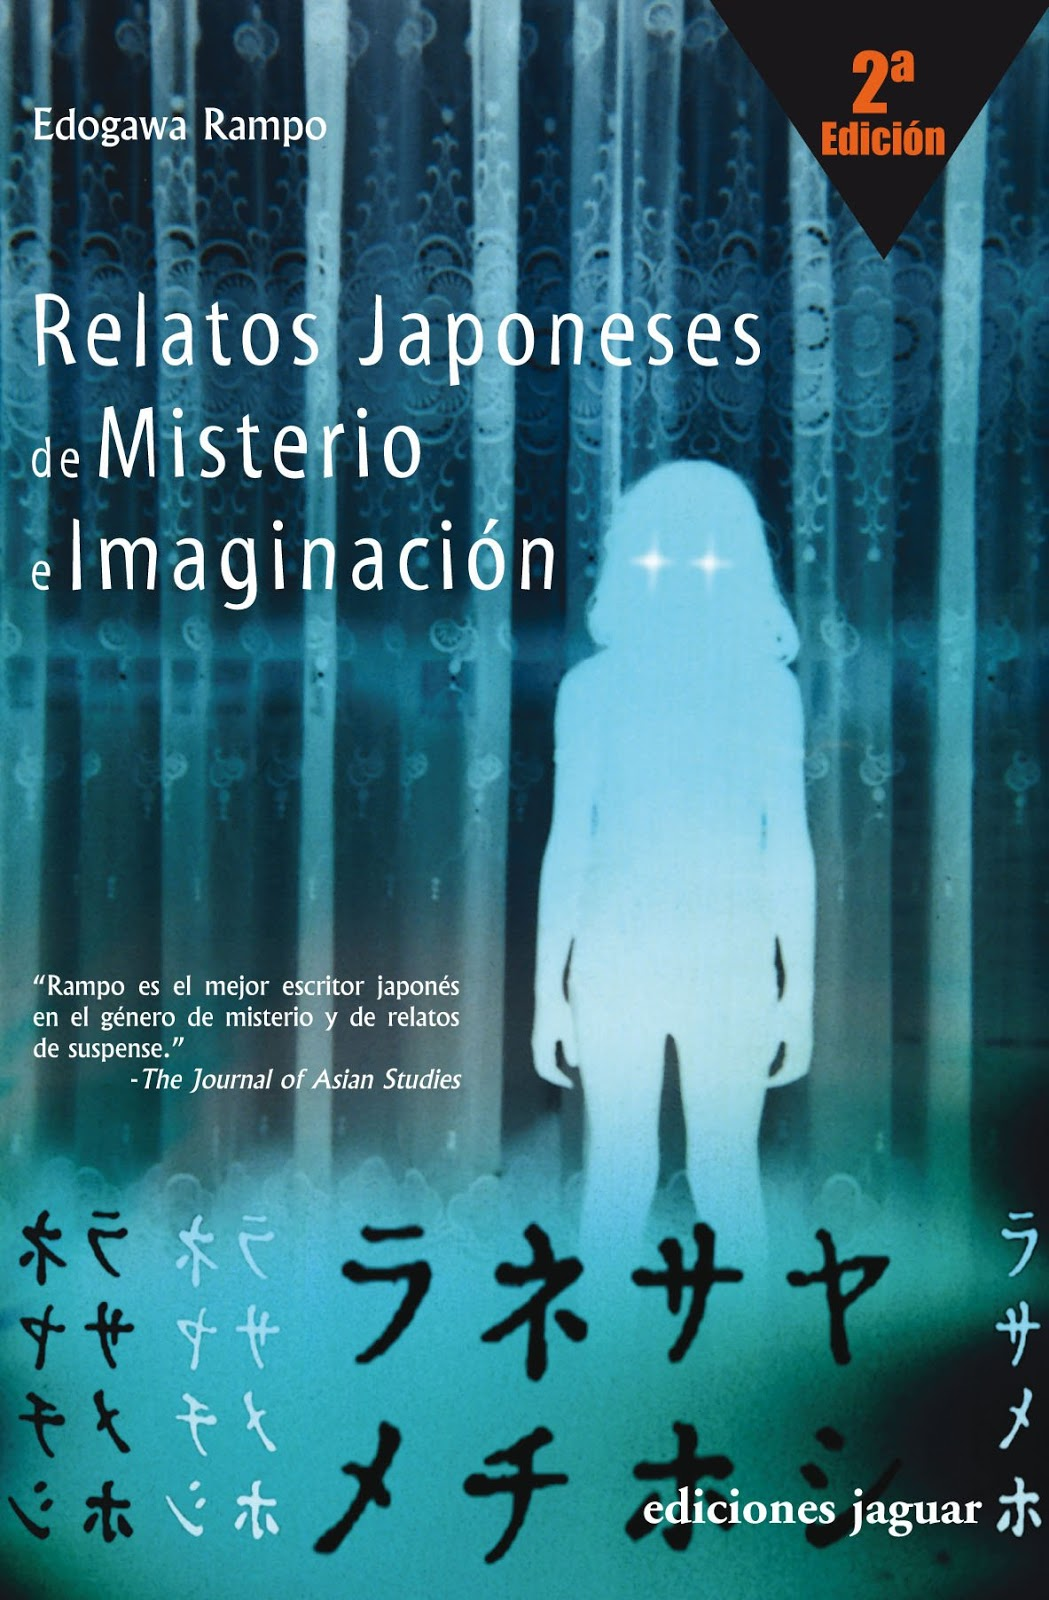 https://labibliotecadebella.blogspot.com.es/2018/03/listo-resena-relatos-japoneses-de.html